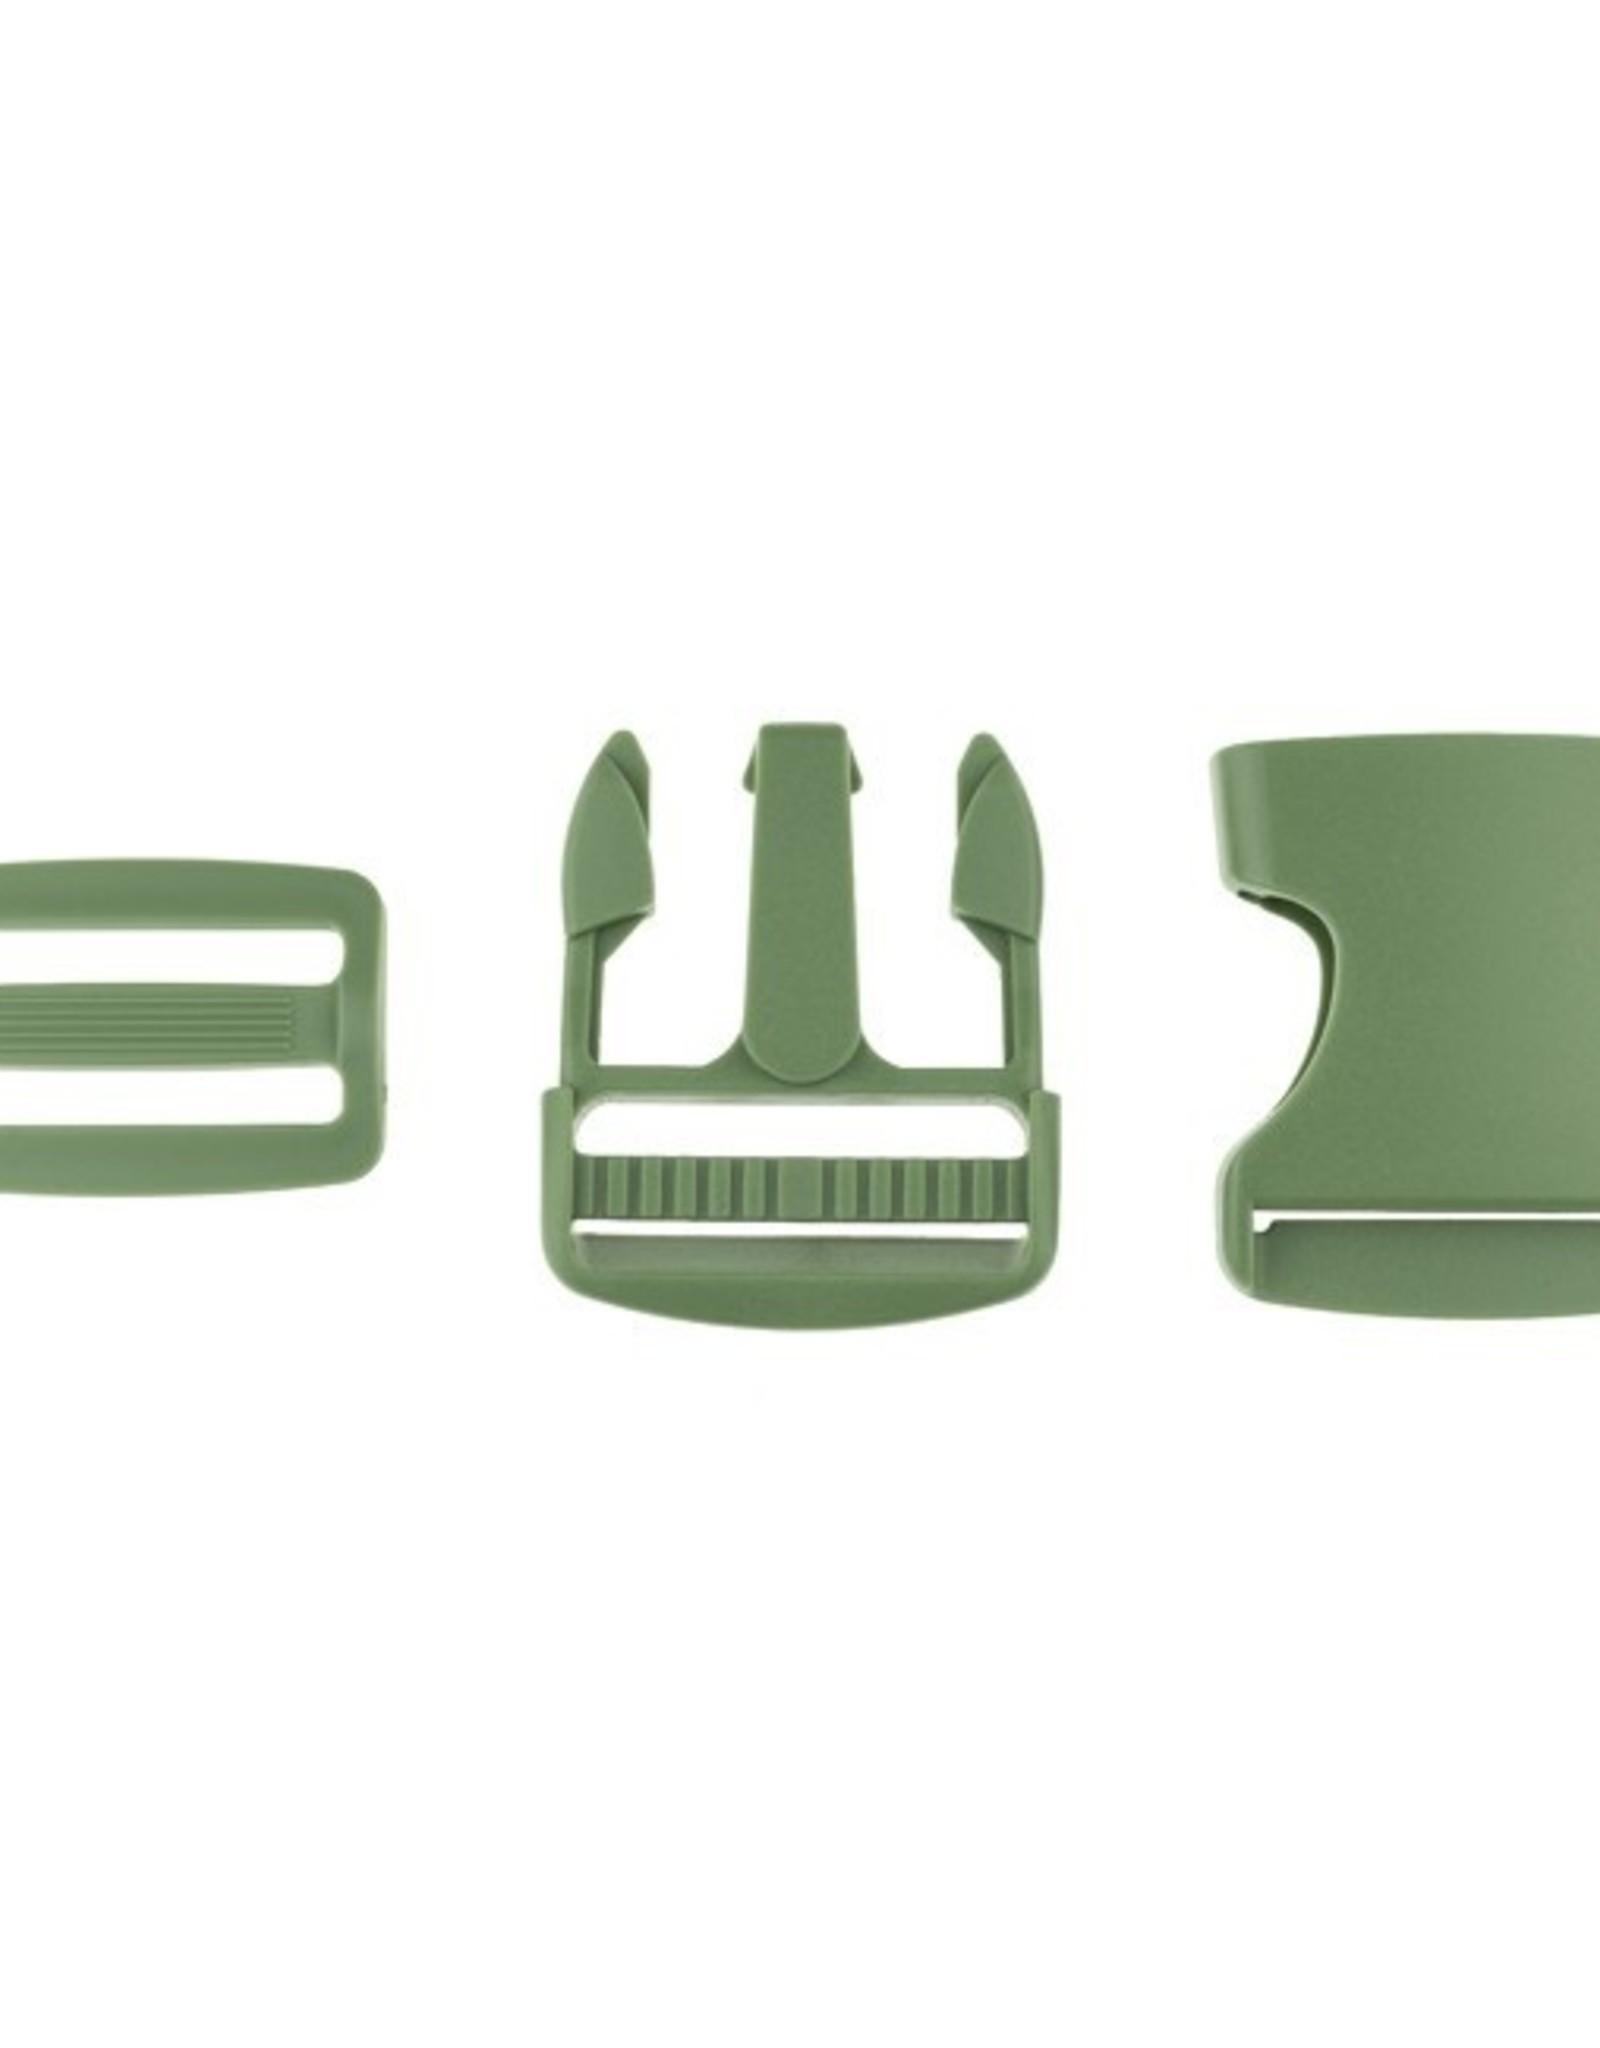 Klikgesp & Schuifgesp - Kaki Groen - 38mm